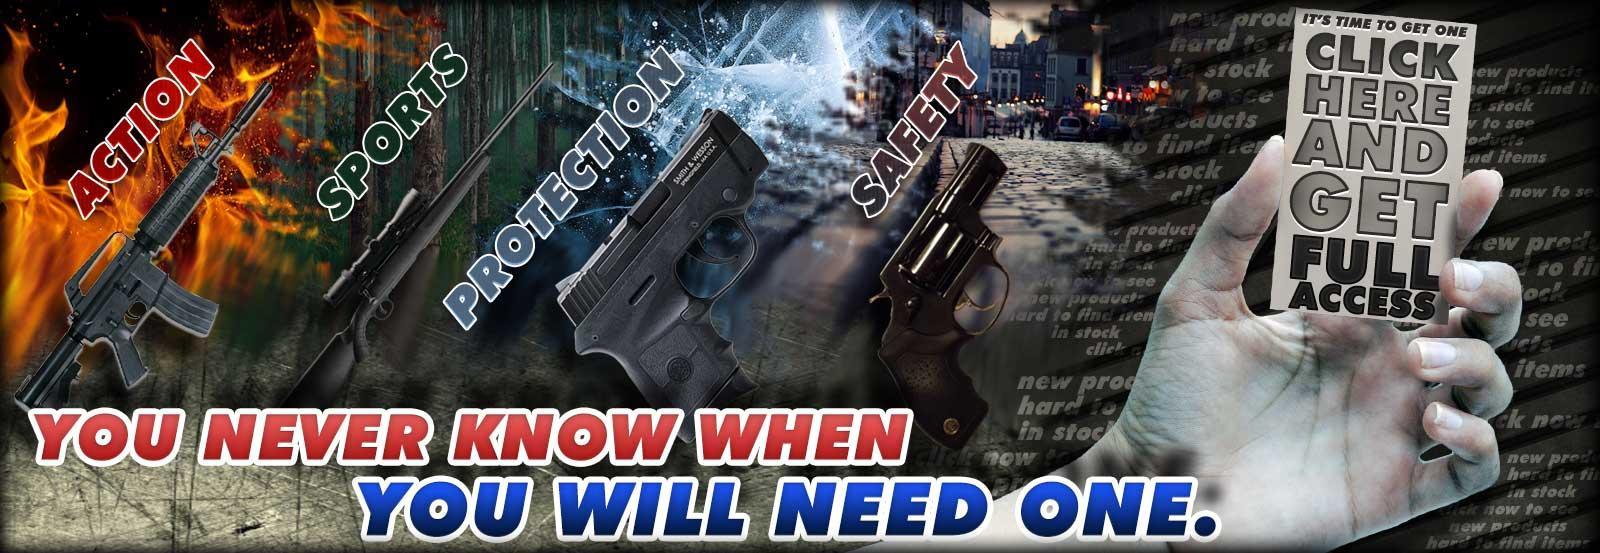 march-accuracy-gun-shop